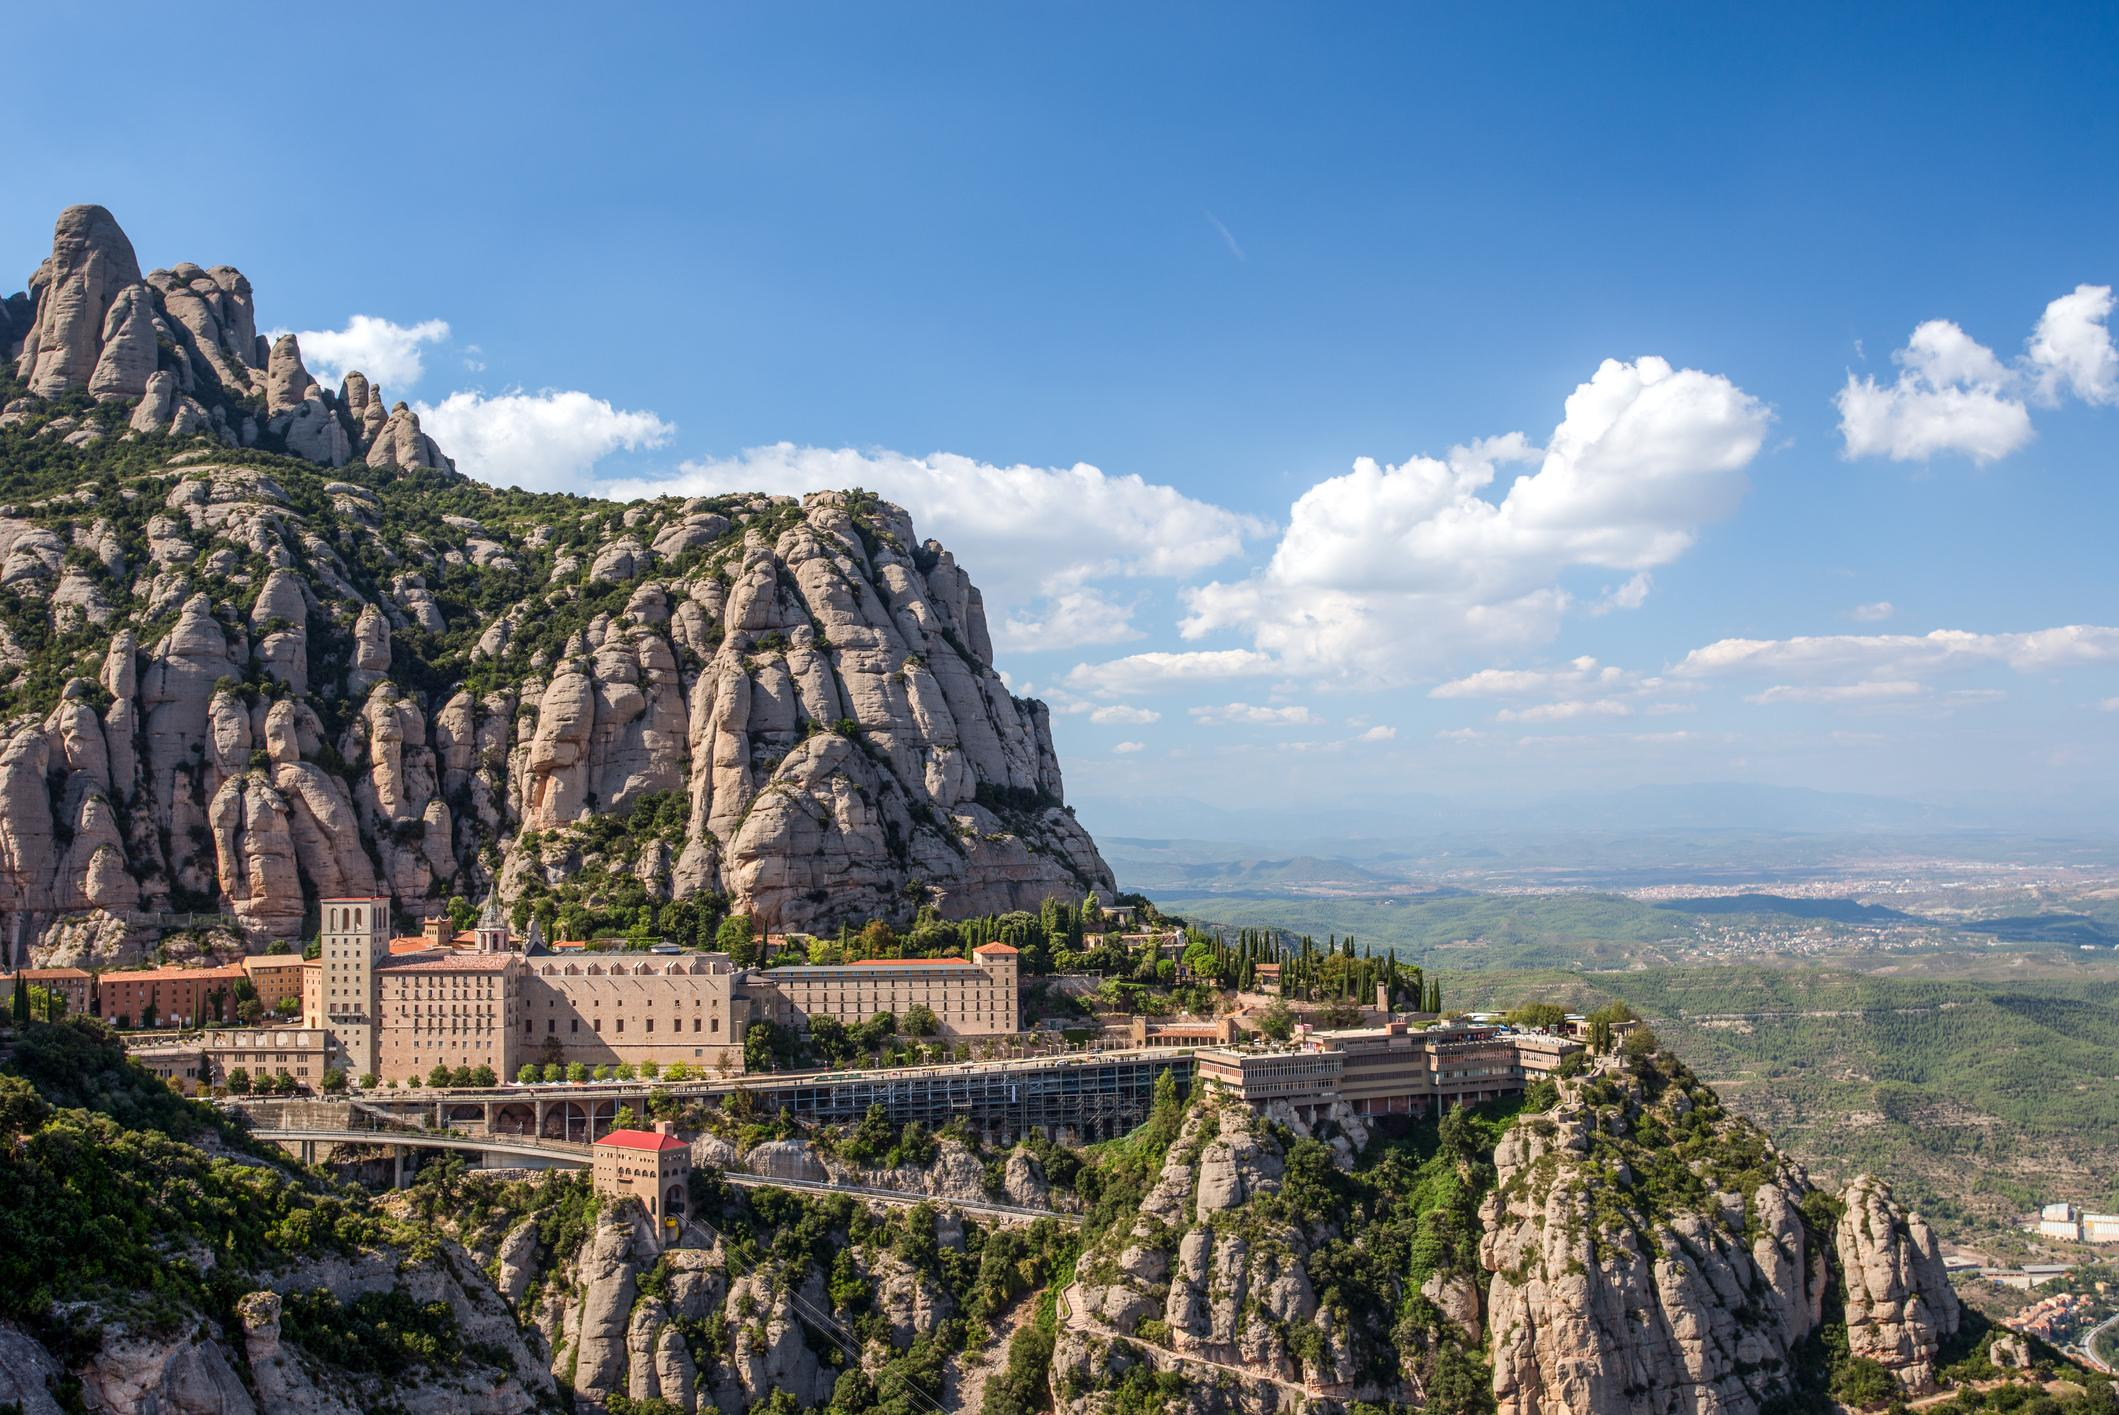 Montserrat-iStock-935671078.jpg